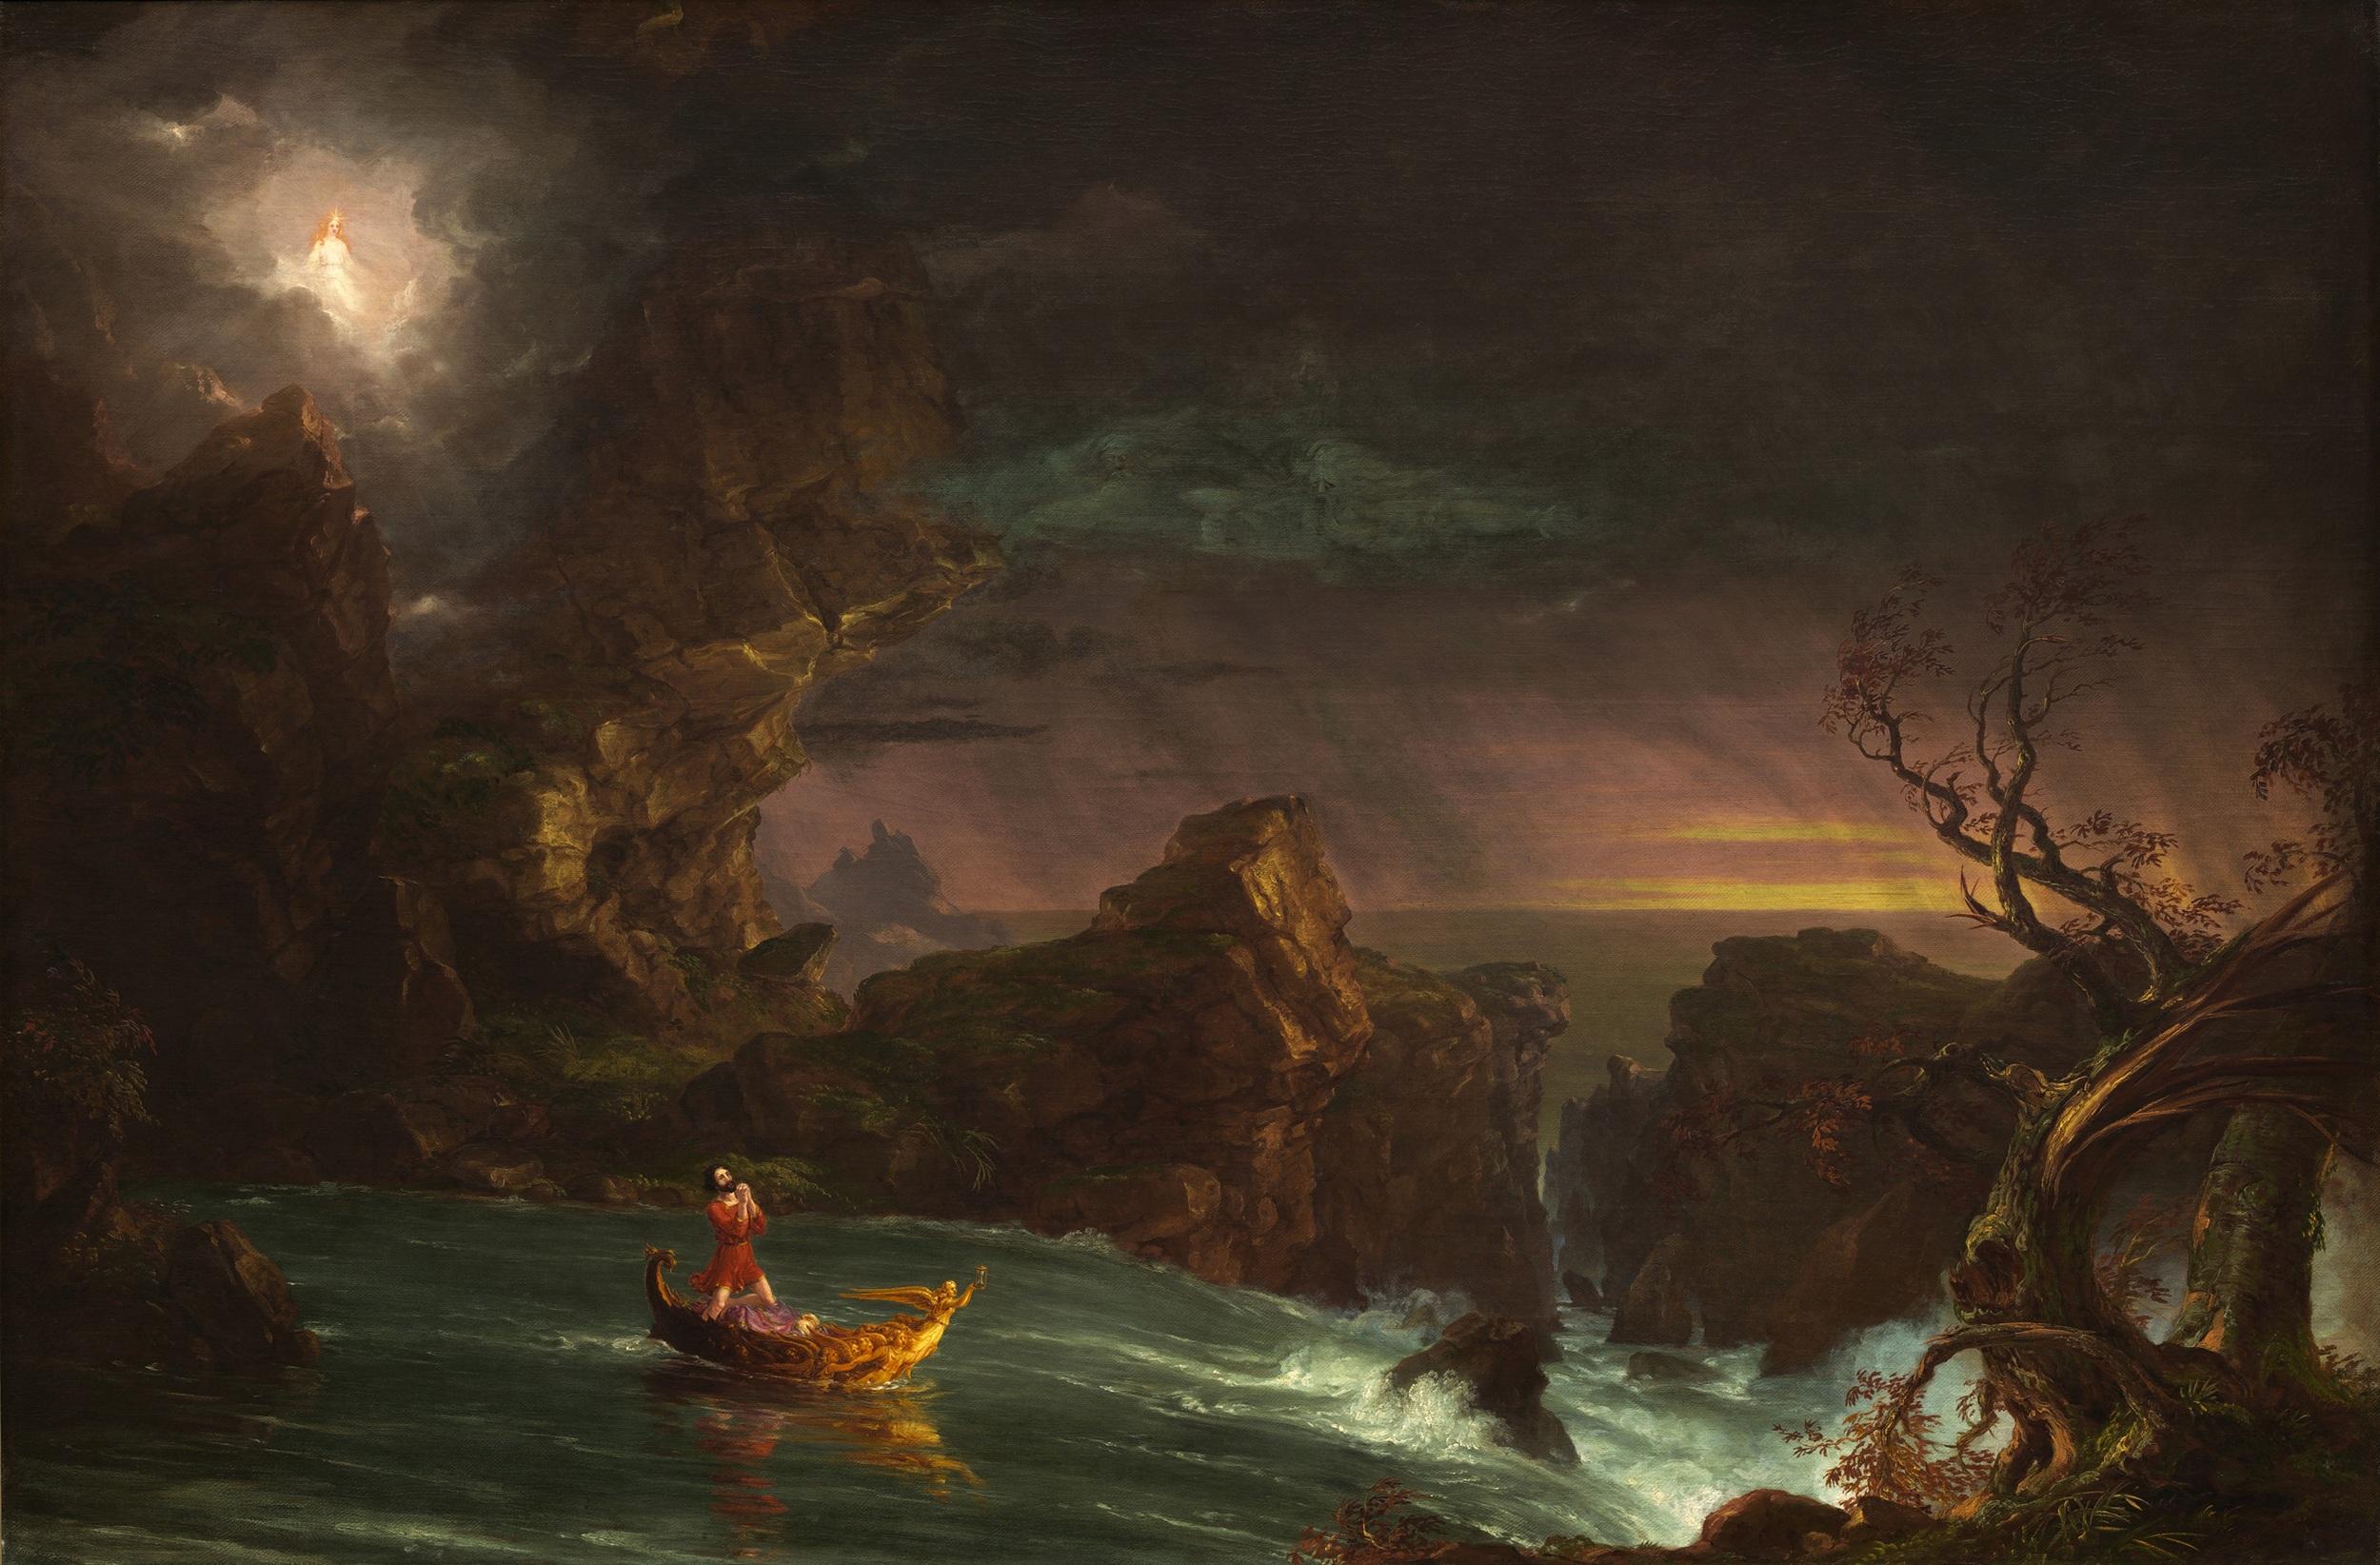 Cole_Thomas_The_Voyage_of_Life_Manhood_1842 (1).jpg